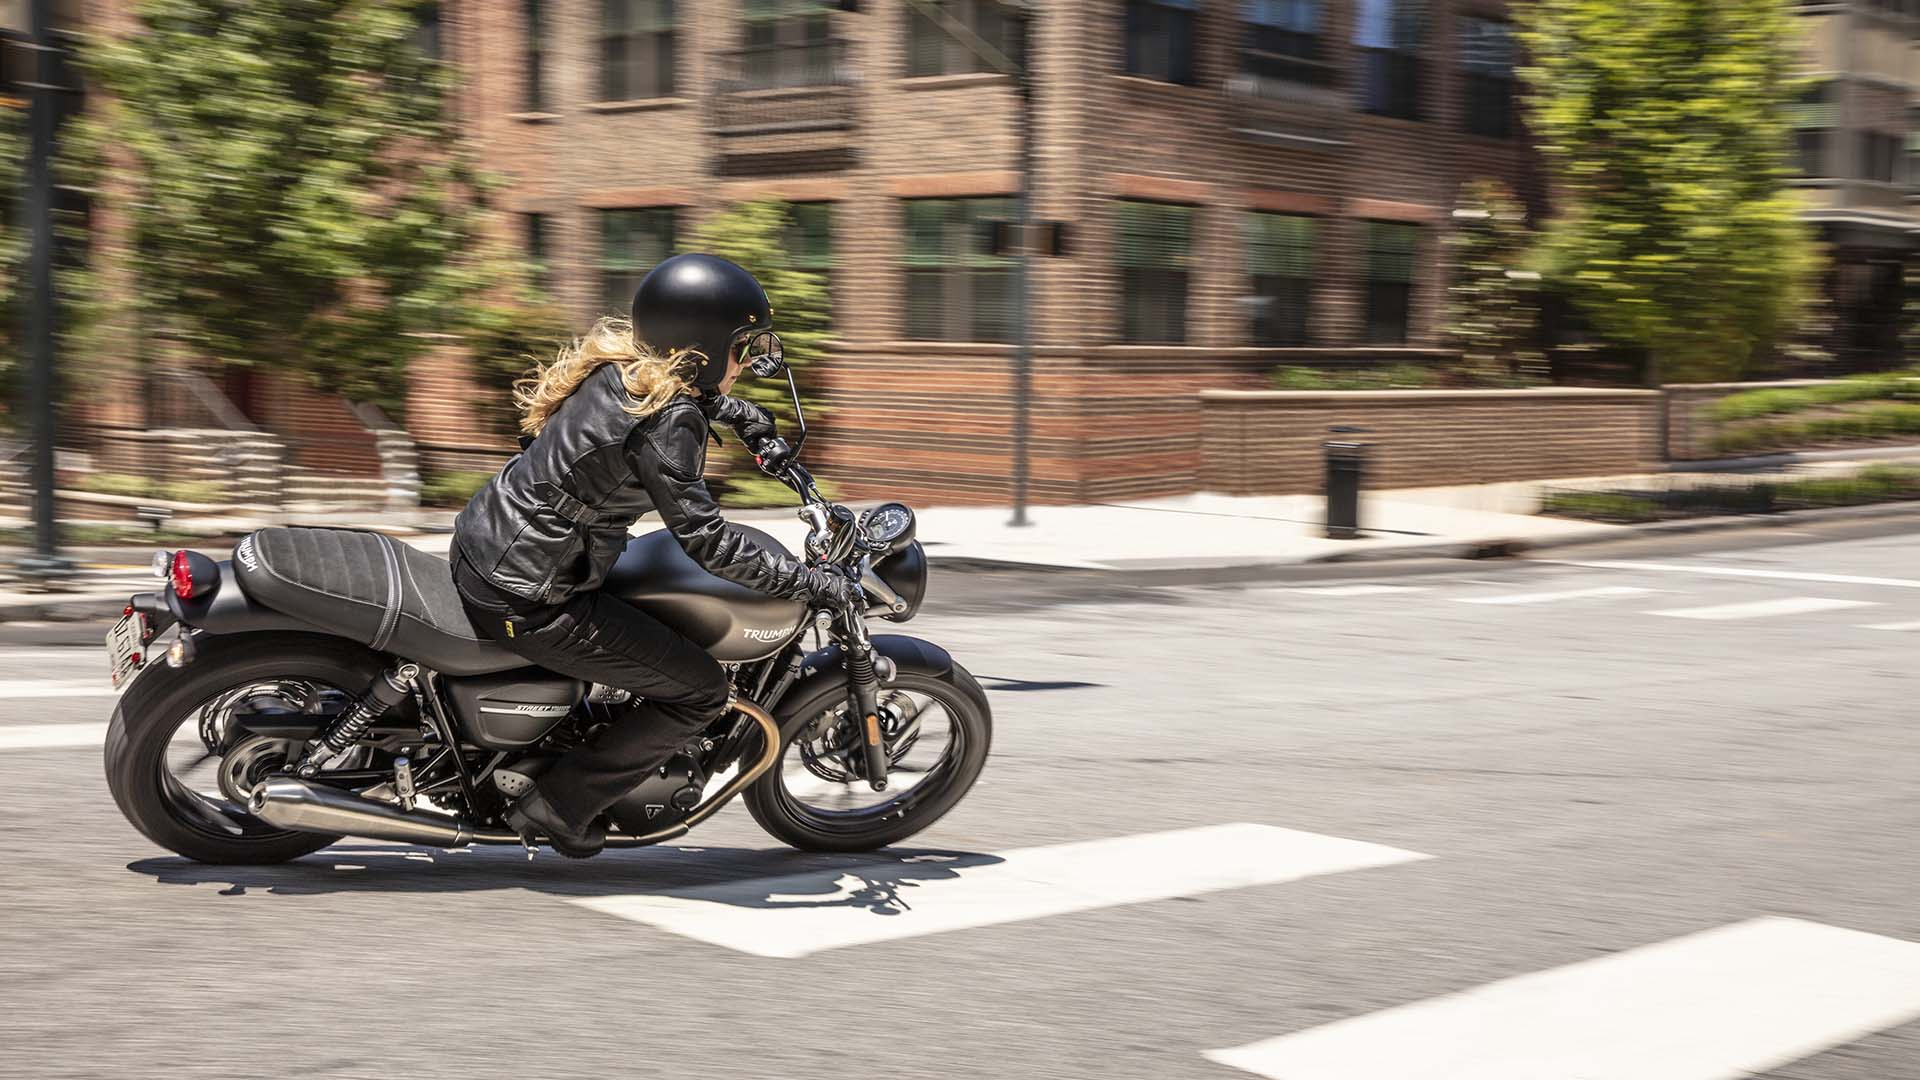 2019 Triumph Street Twin Hero Image